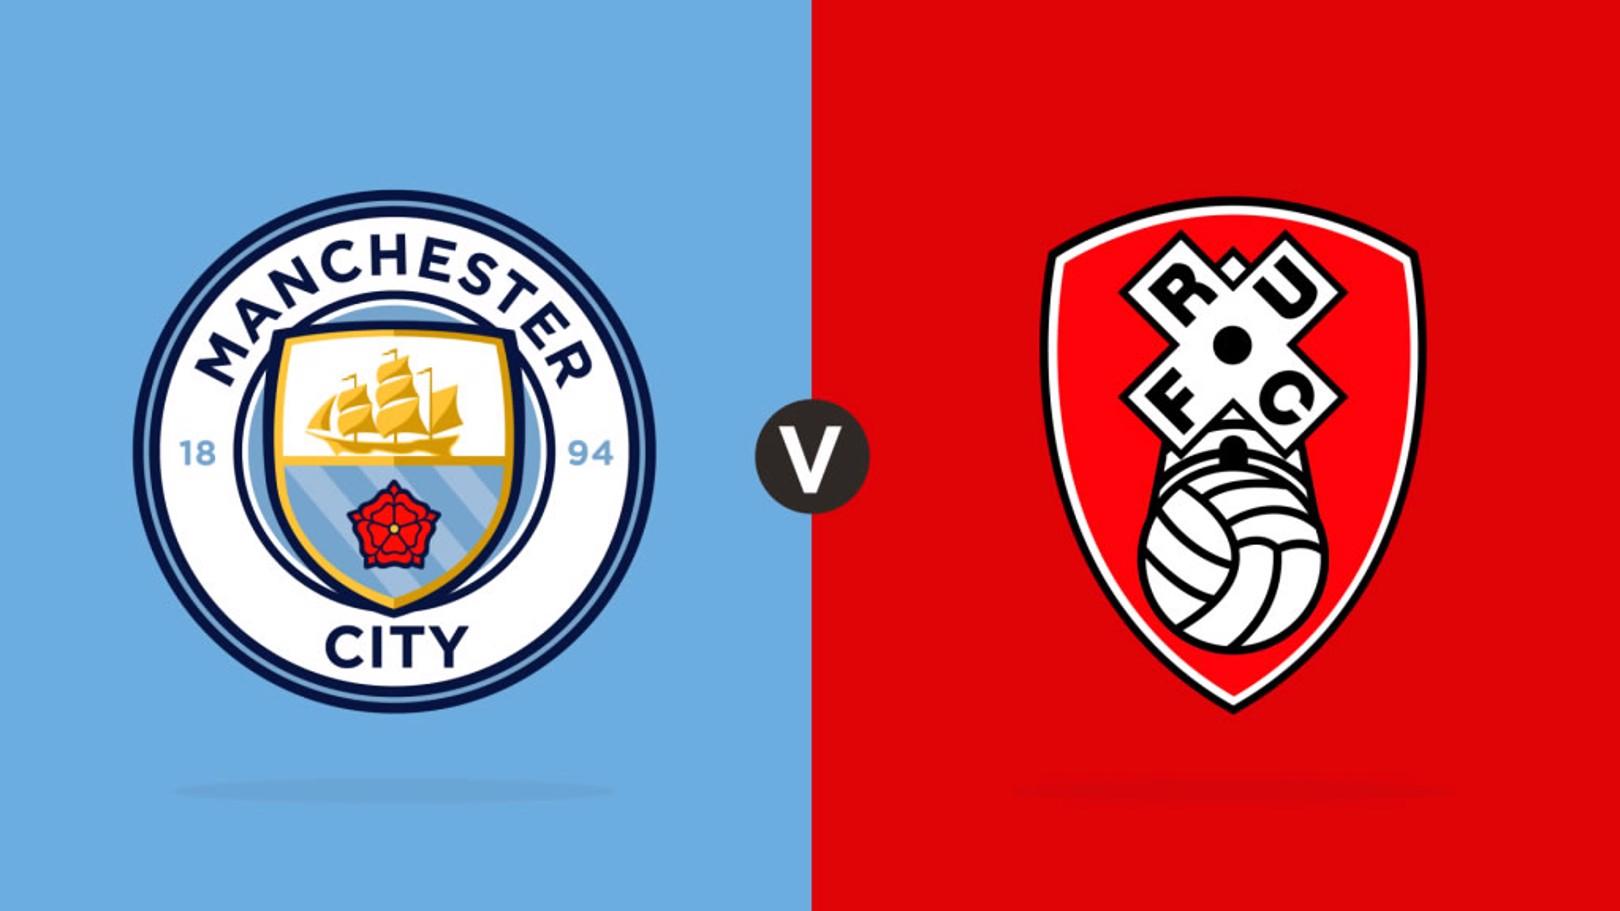 Man City - Rotherham United.